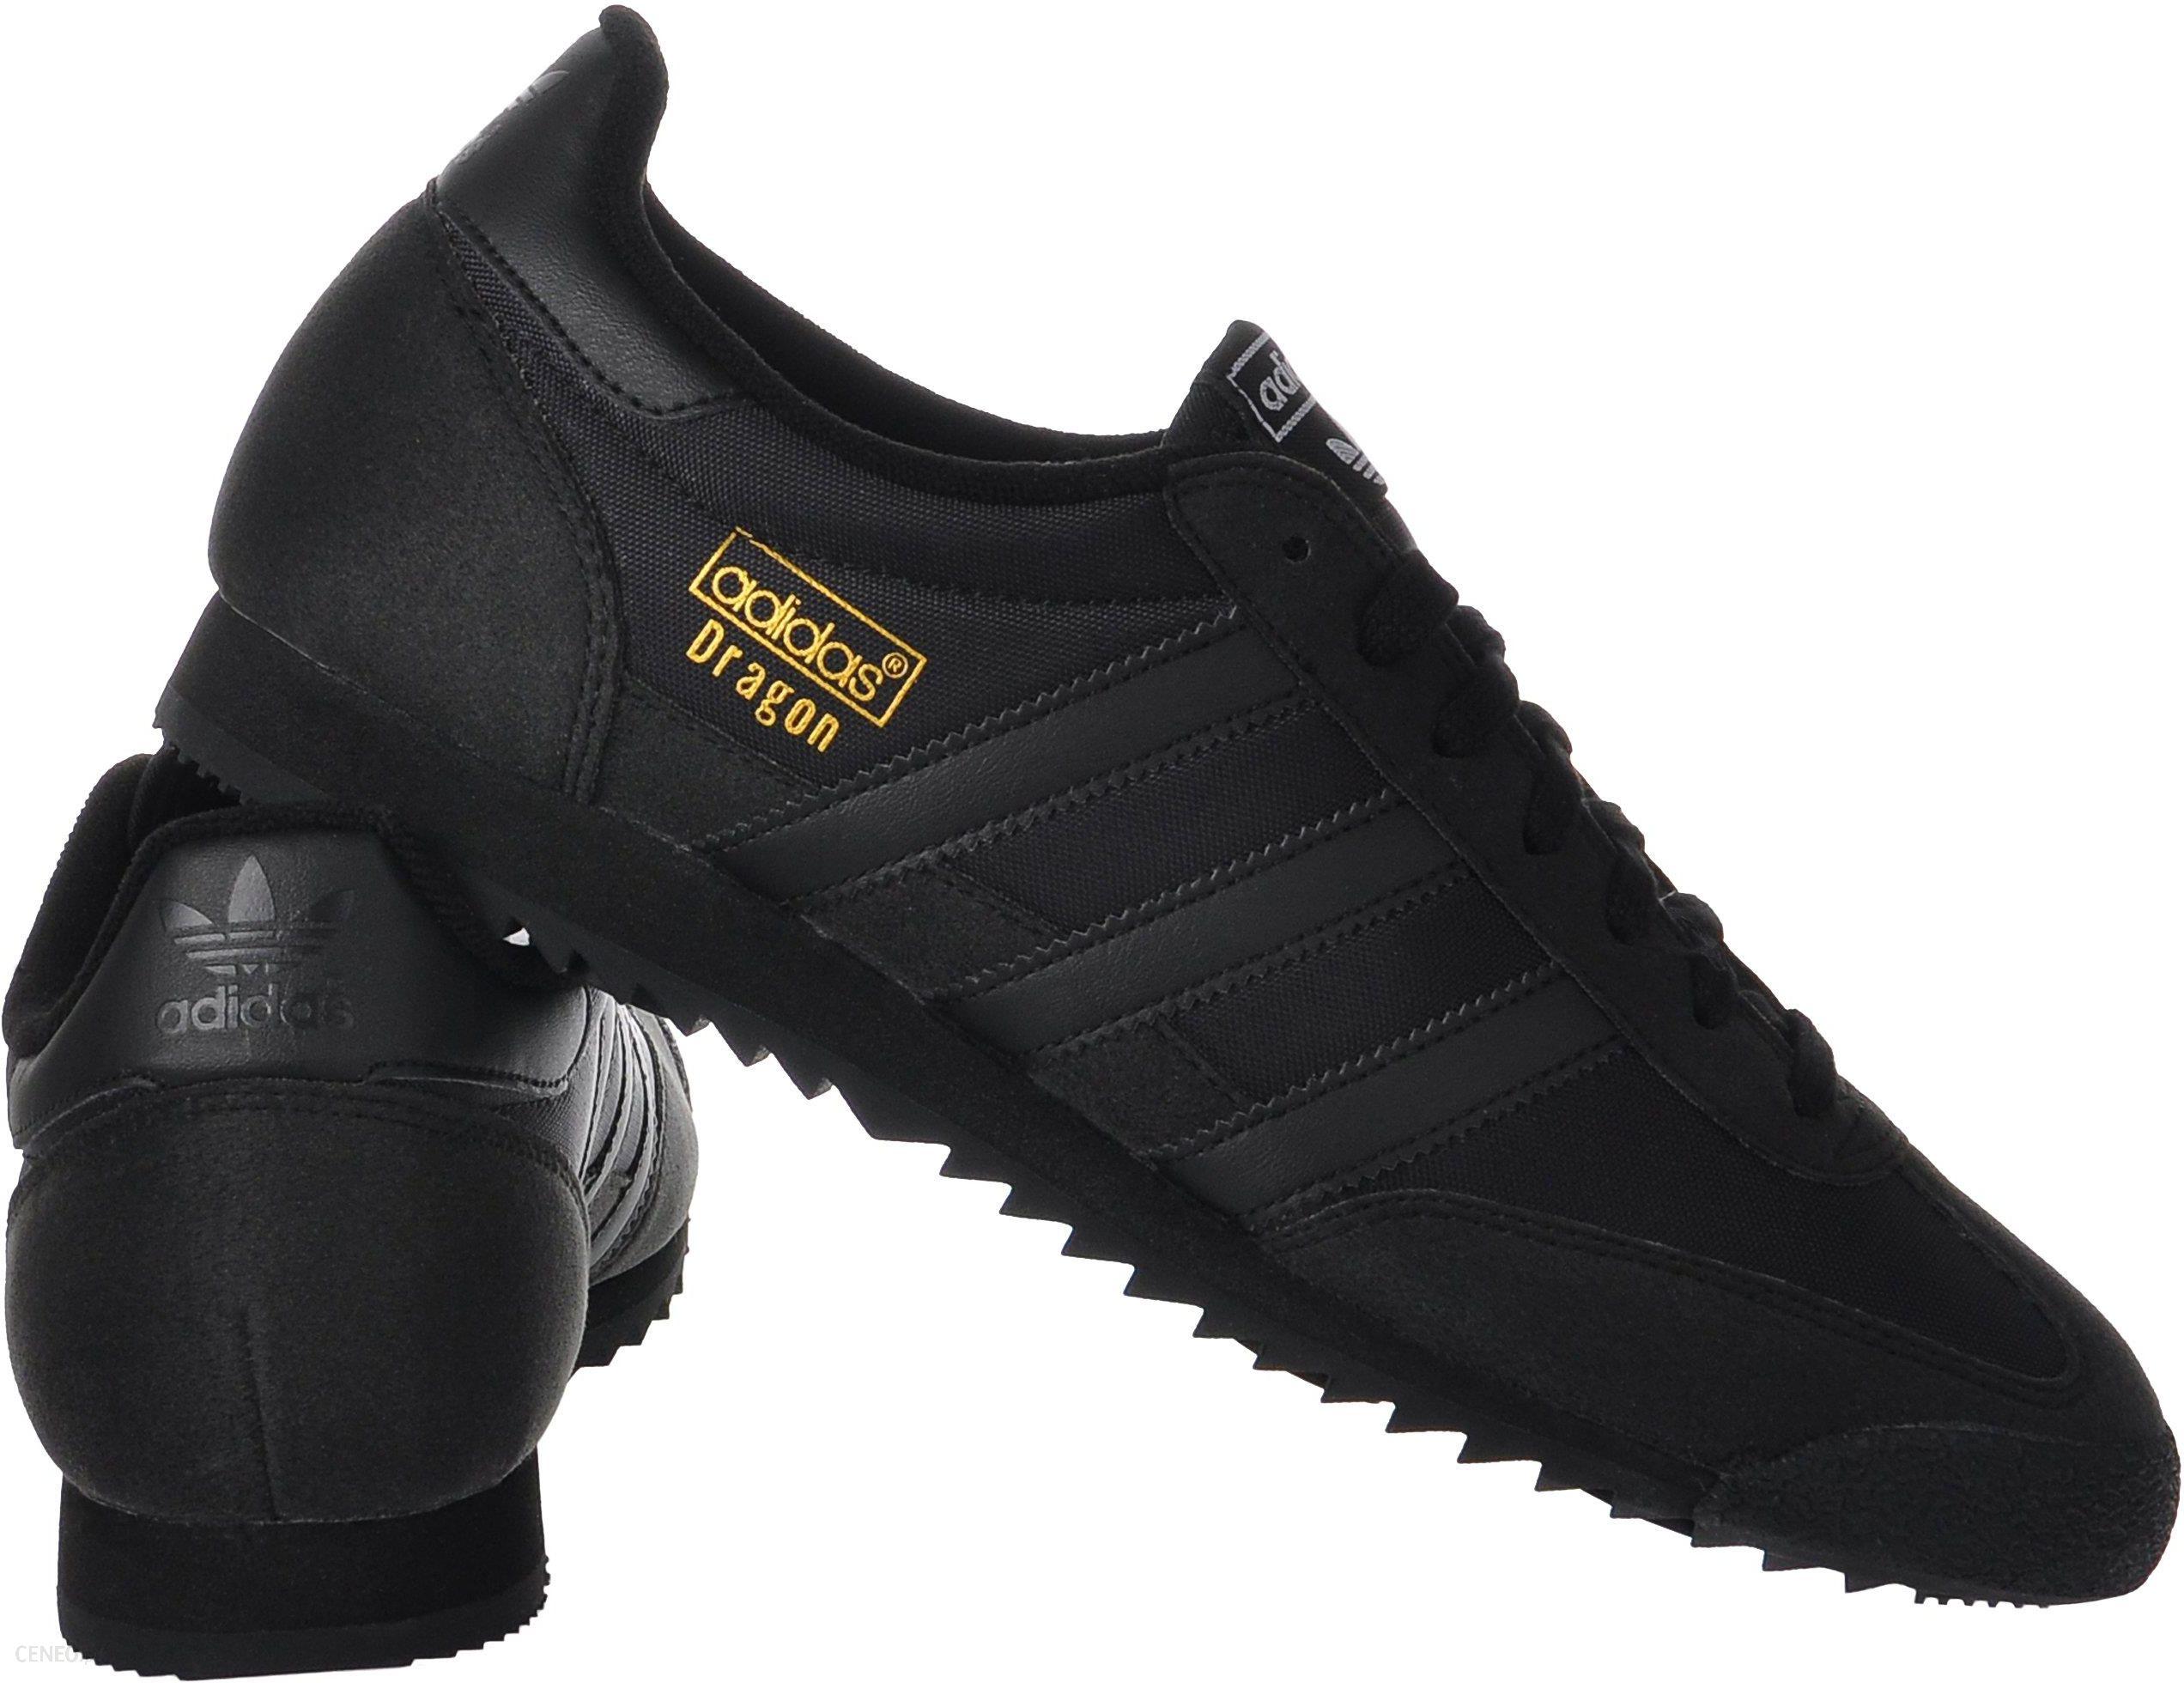 quality design d1132 4d9e5 adidas dragon damskie czarne